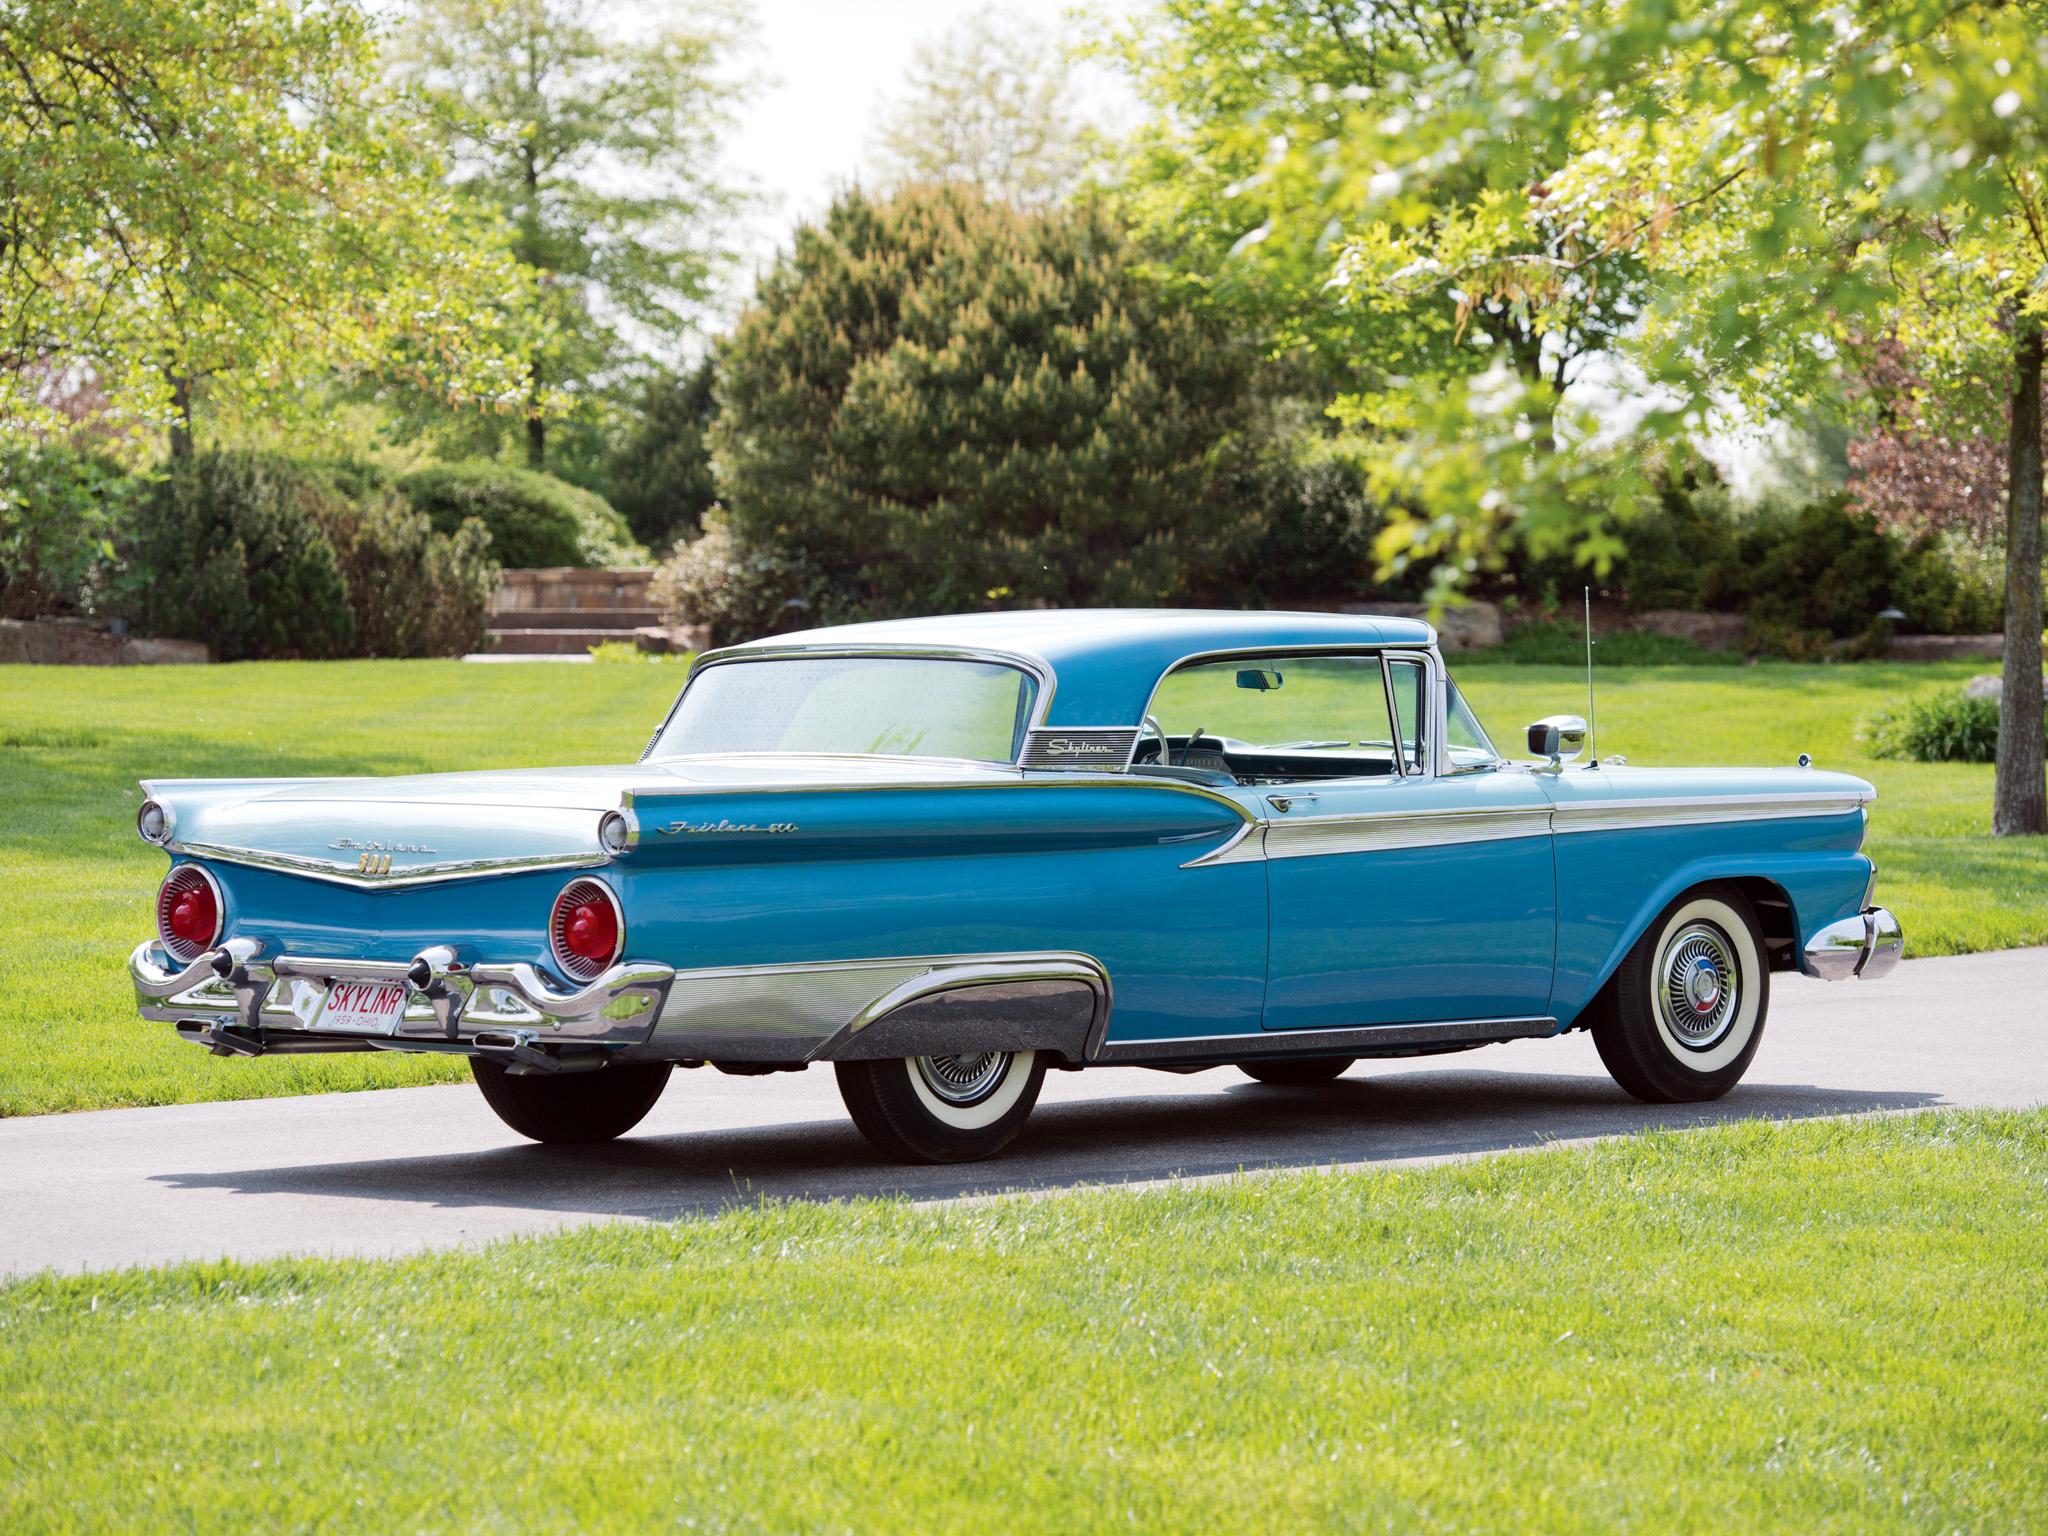 Ford F >> 1959 Ford Fairlane 500 Skyliner Retractable Hardtop retro r wallpaper | 2048x1536 | 180017 ...